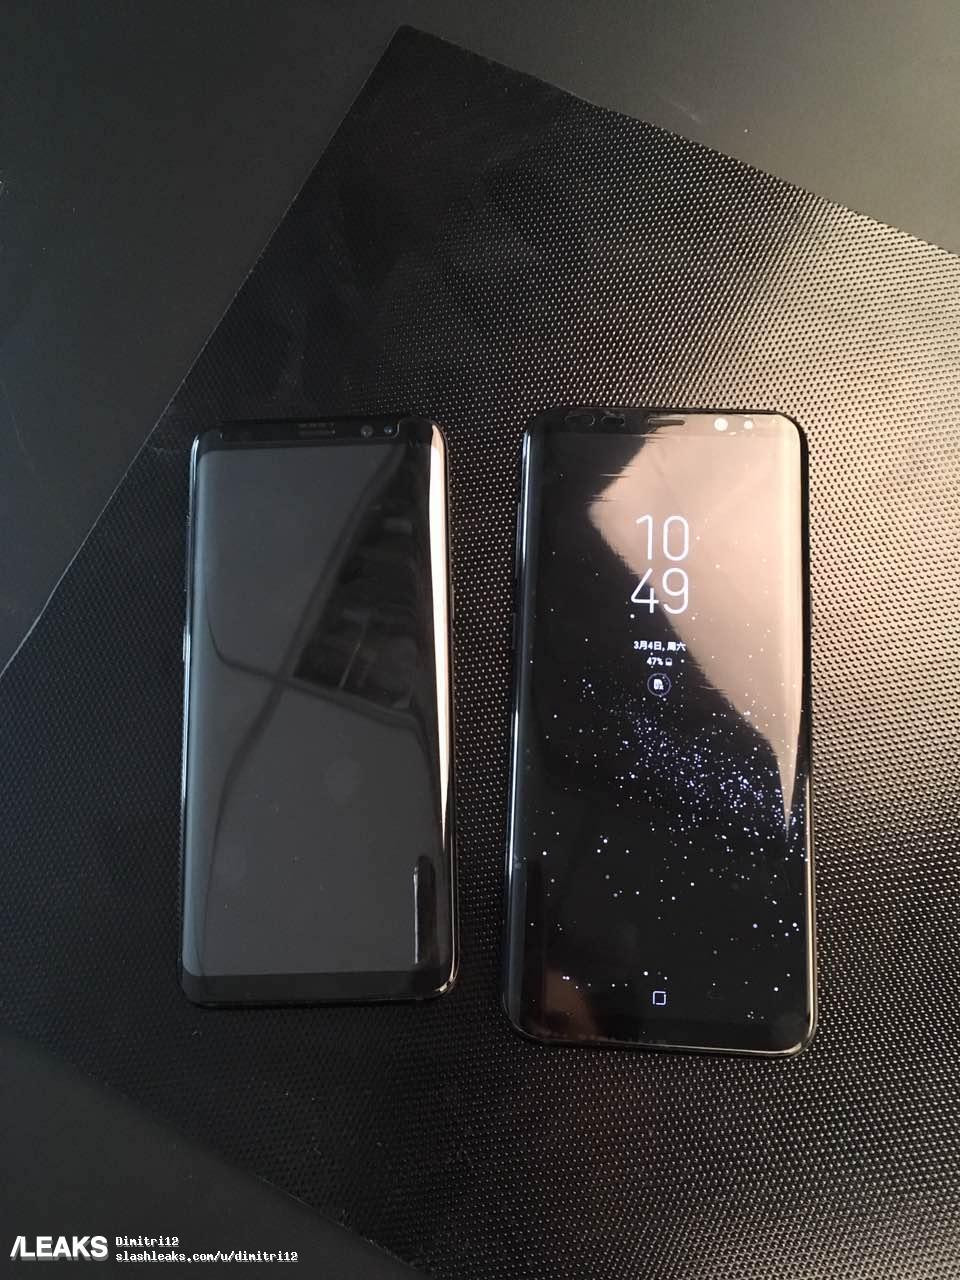 Samsung Galaxy S8 and Galaxy S8 Plus